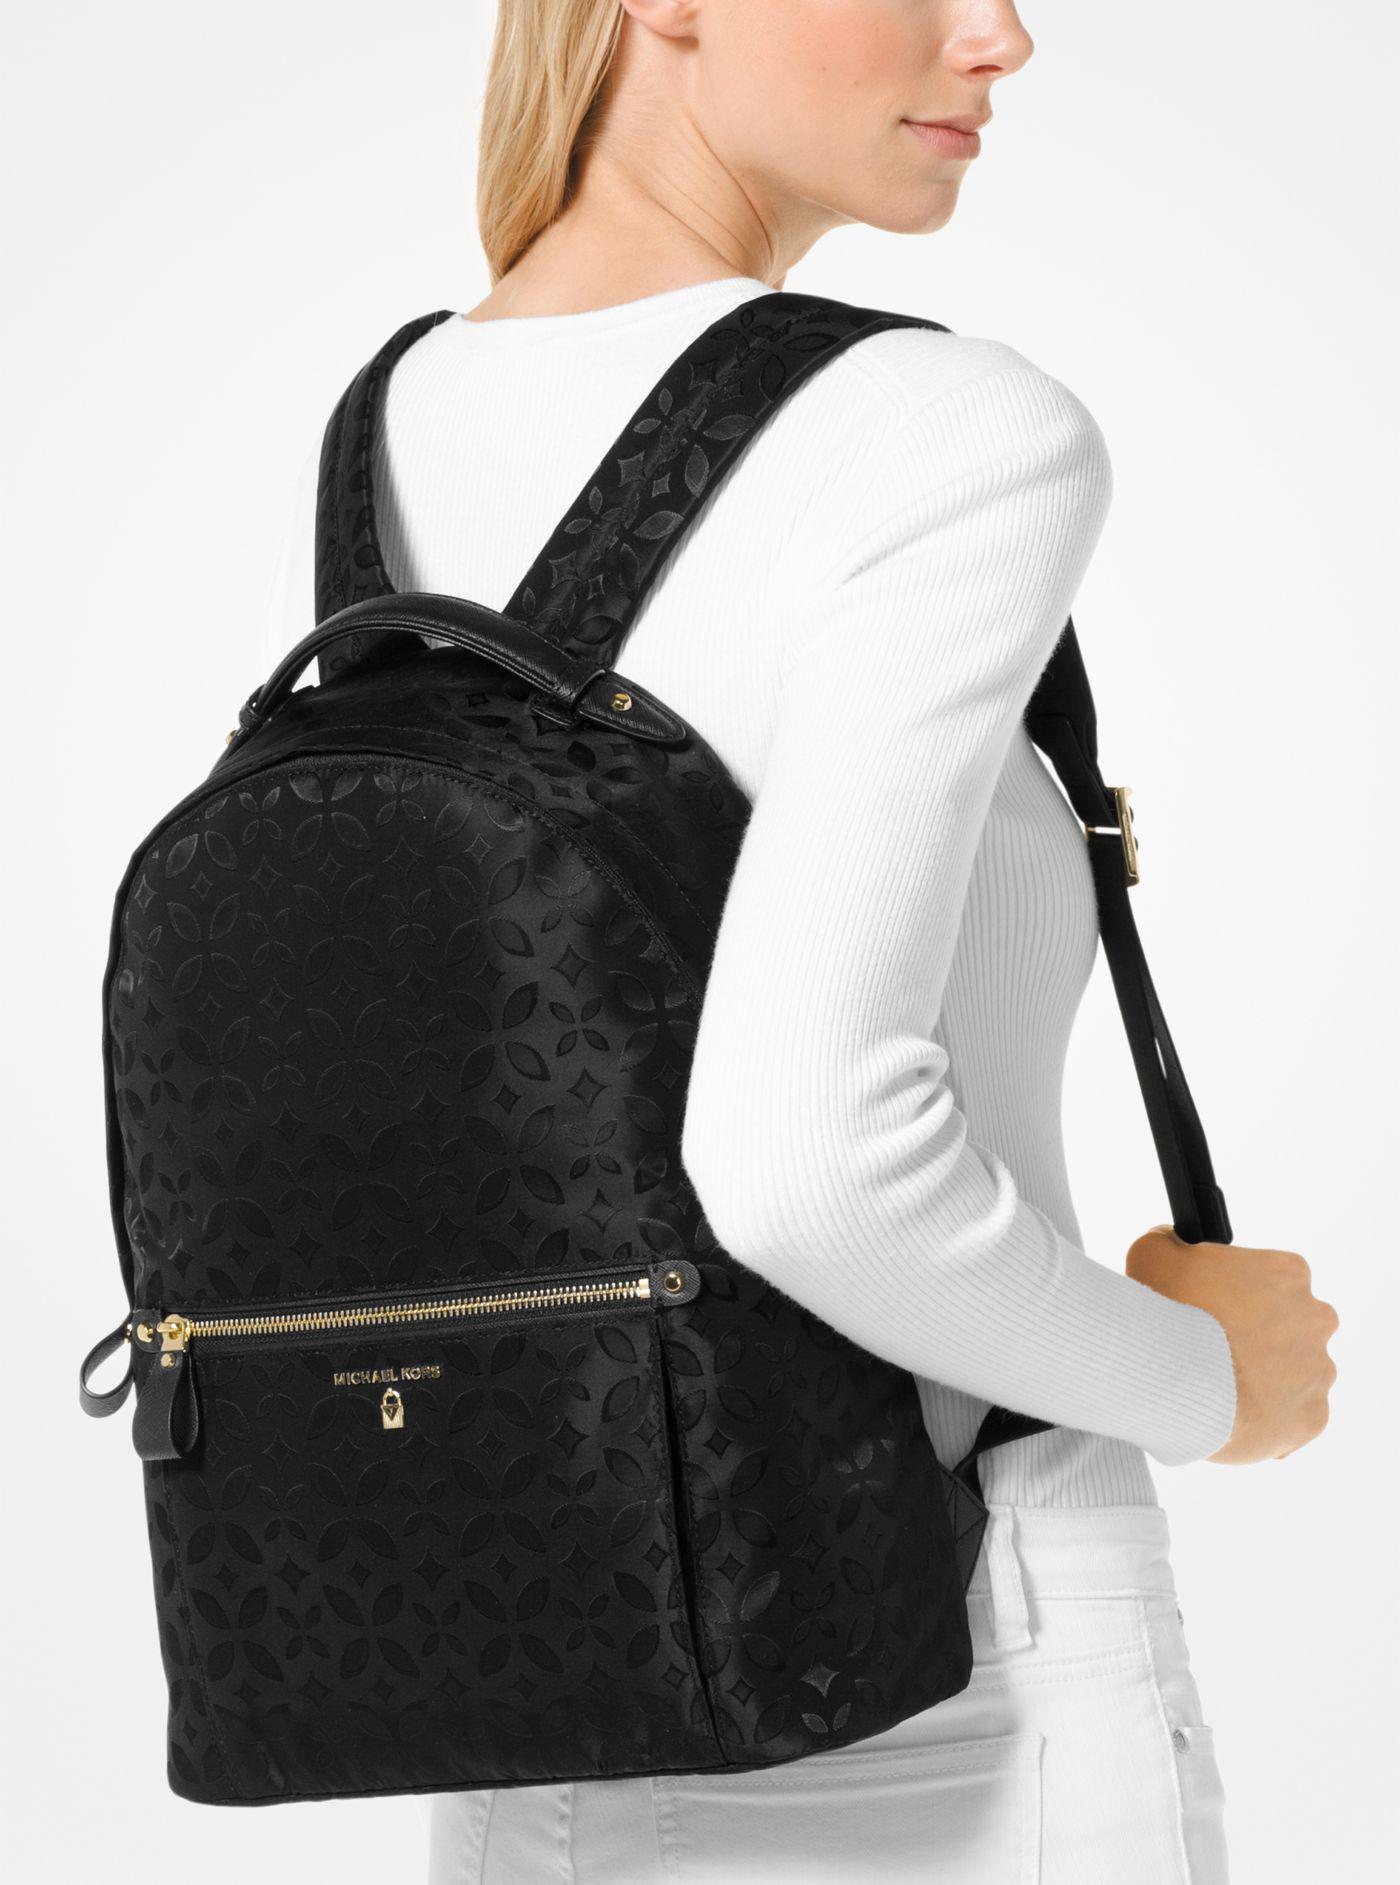 a029eedd78c3 Lyst - Michael Kors Michael Nylon Kelsey Signature Backpack in Black